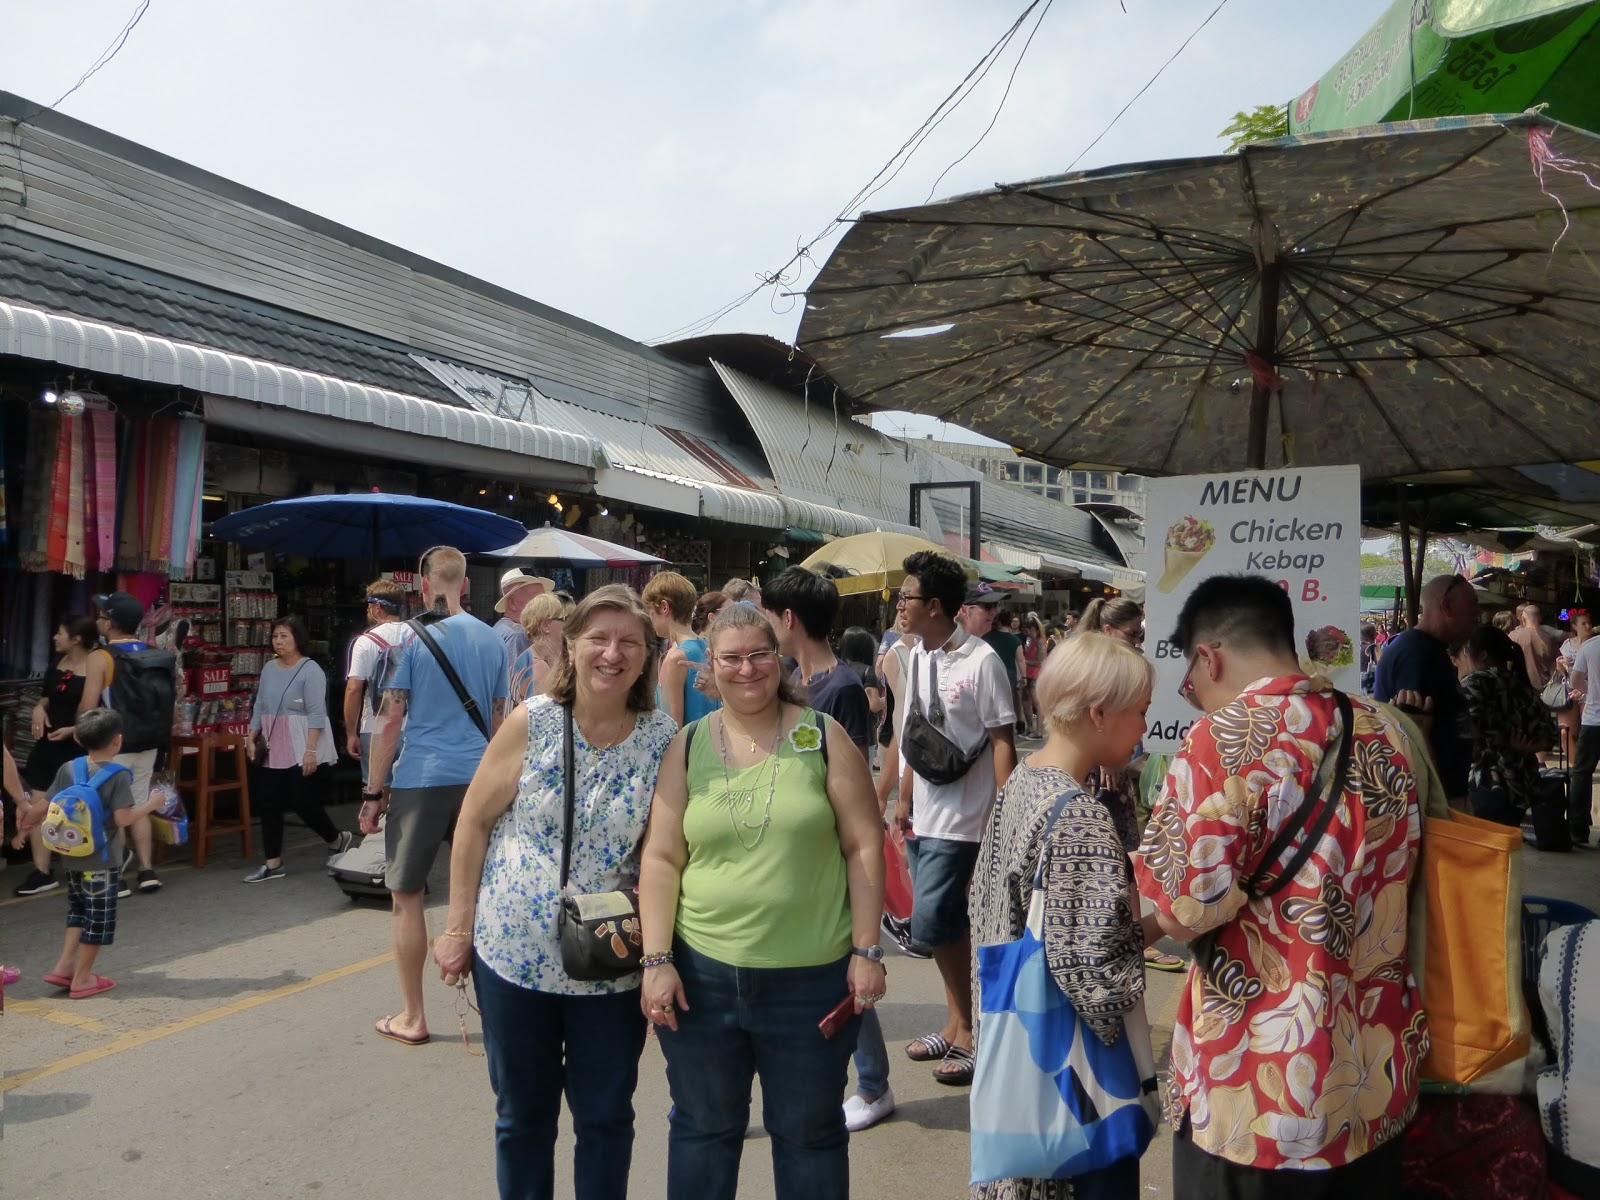 Mercado de Chatuchack, Bangkok, Tailandia, La vuelta al mundo de Asun y Ricardo, vuelta al mundo, round the world, mundoporlibre.com